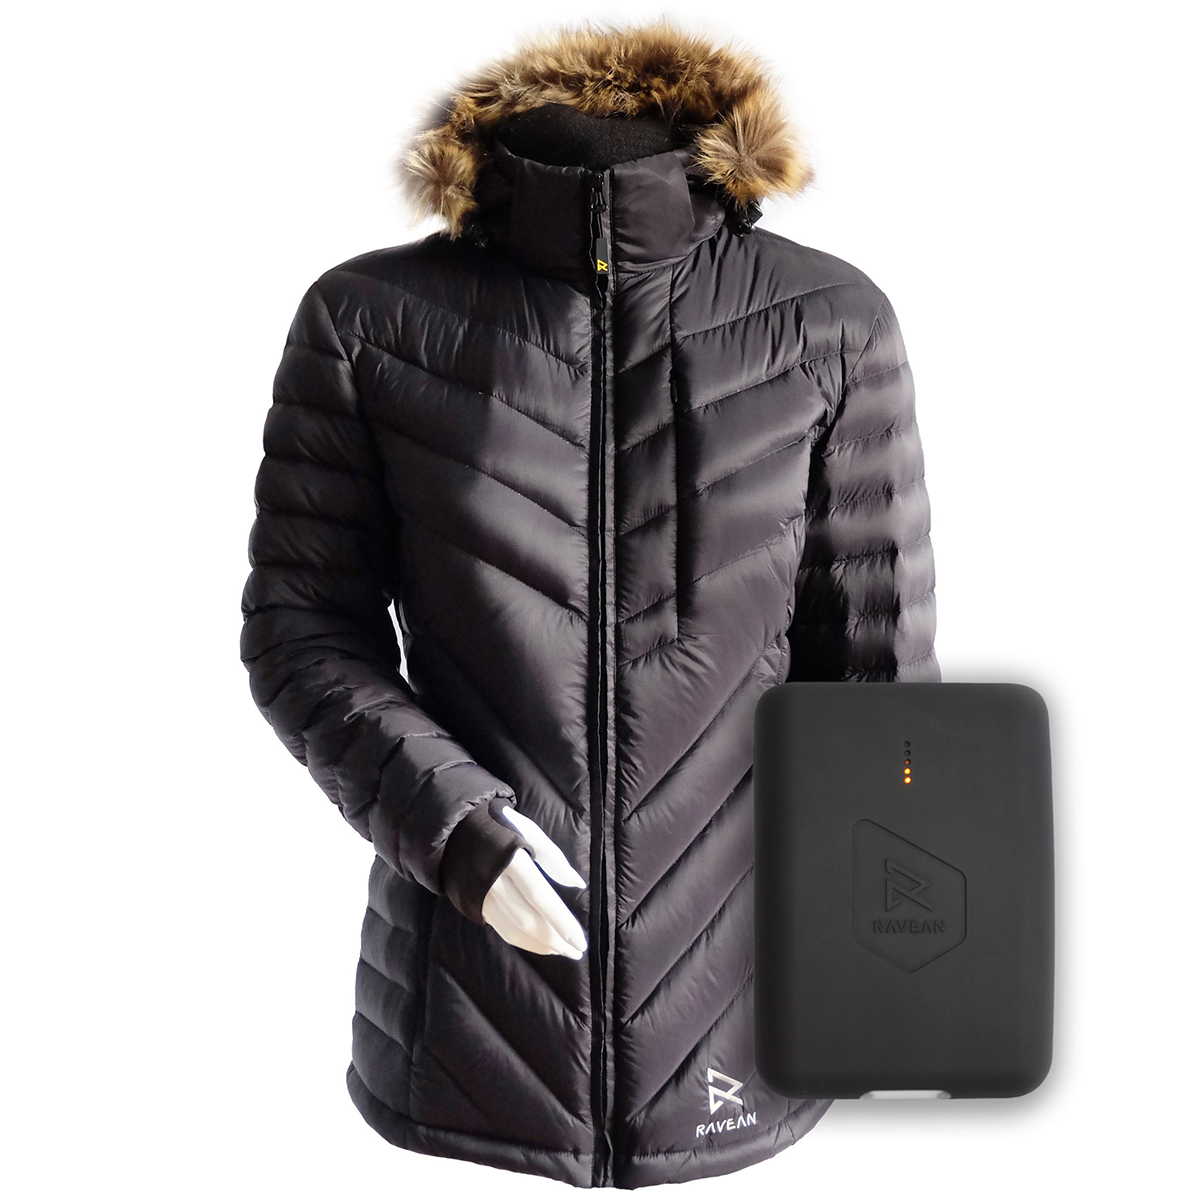 Ravean Women's Down, Heated Jacket